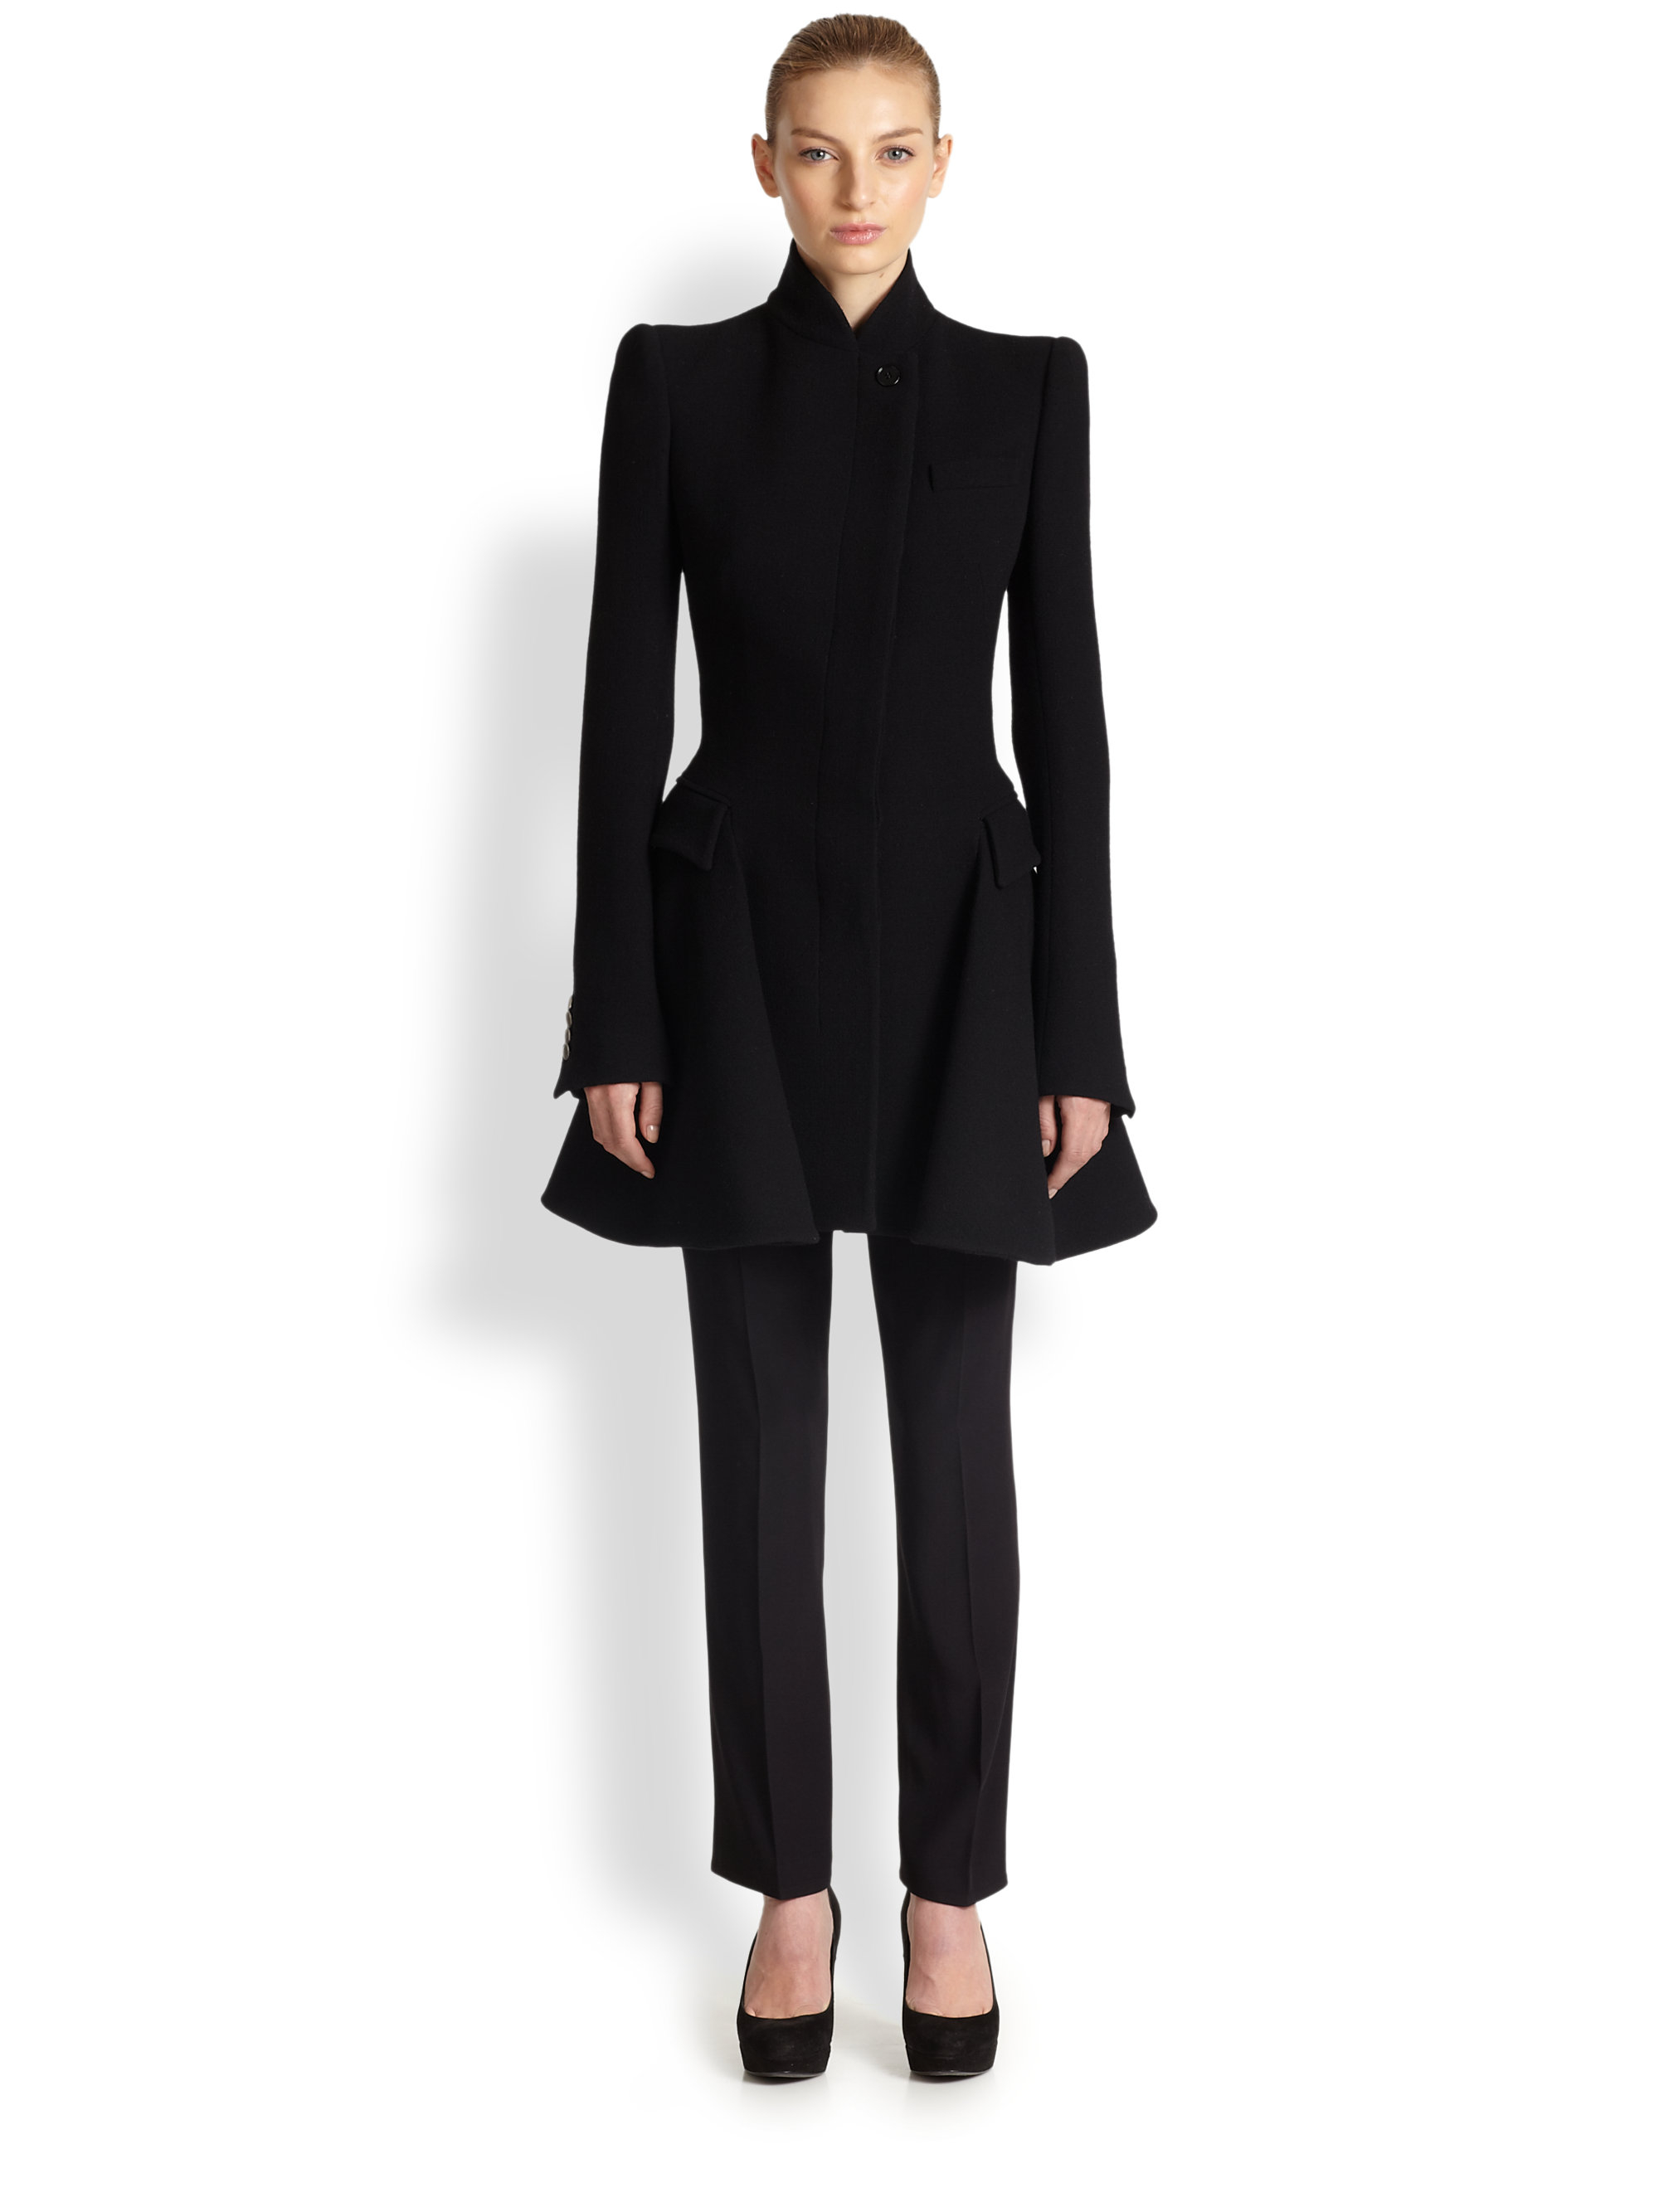 Alexander mcqueen Wool Coat Dress in Black | Lyst